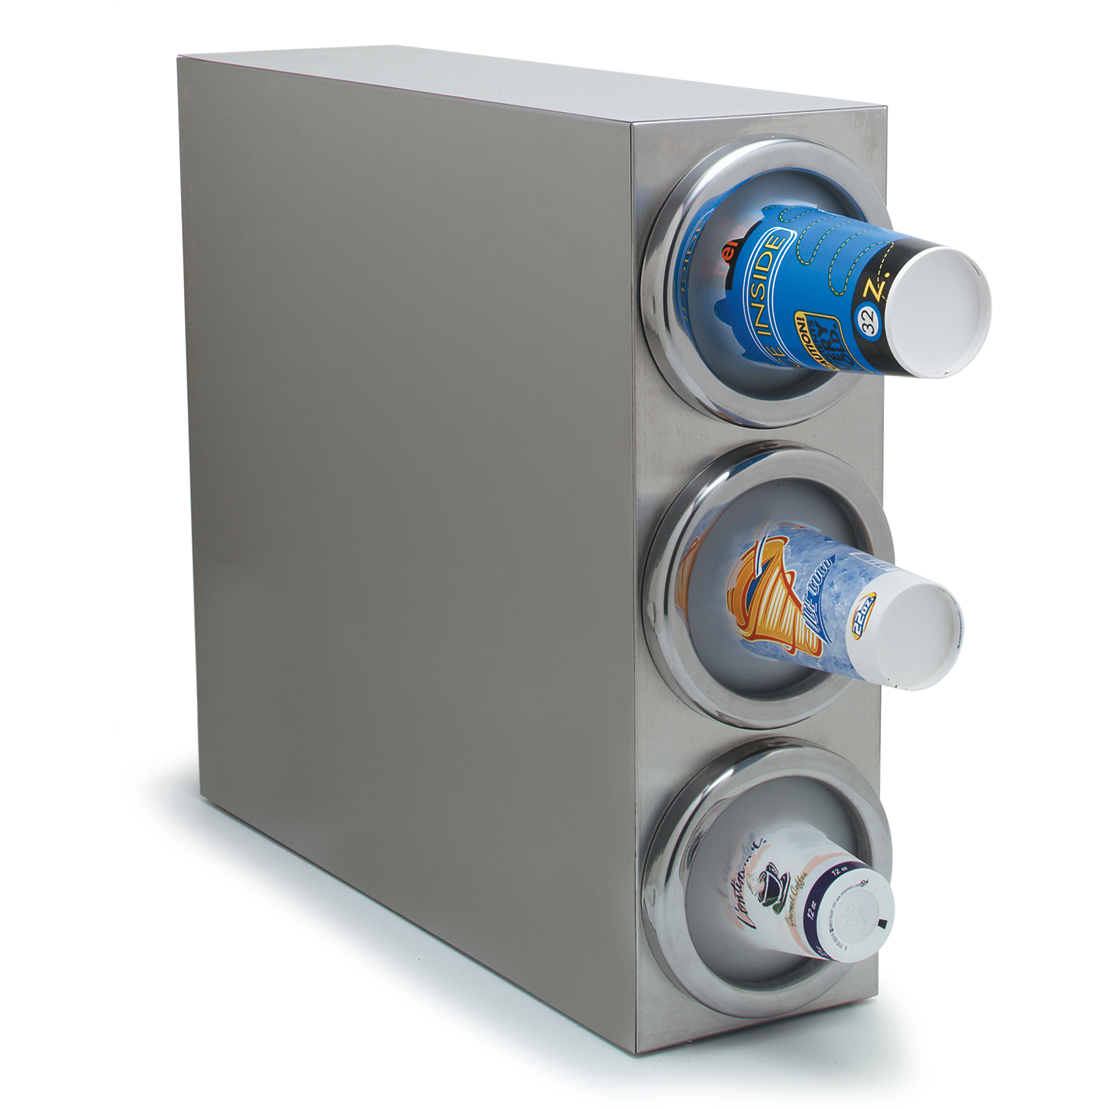 Carlisle 38883G cup dispensers, countertop